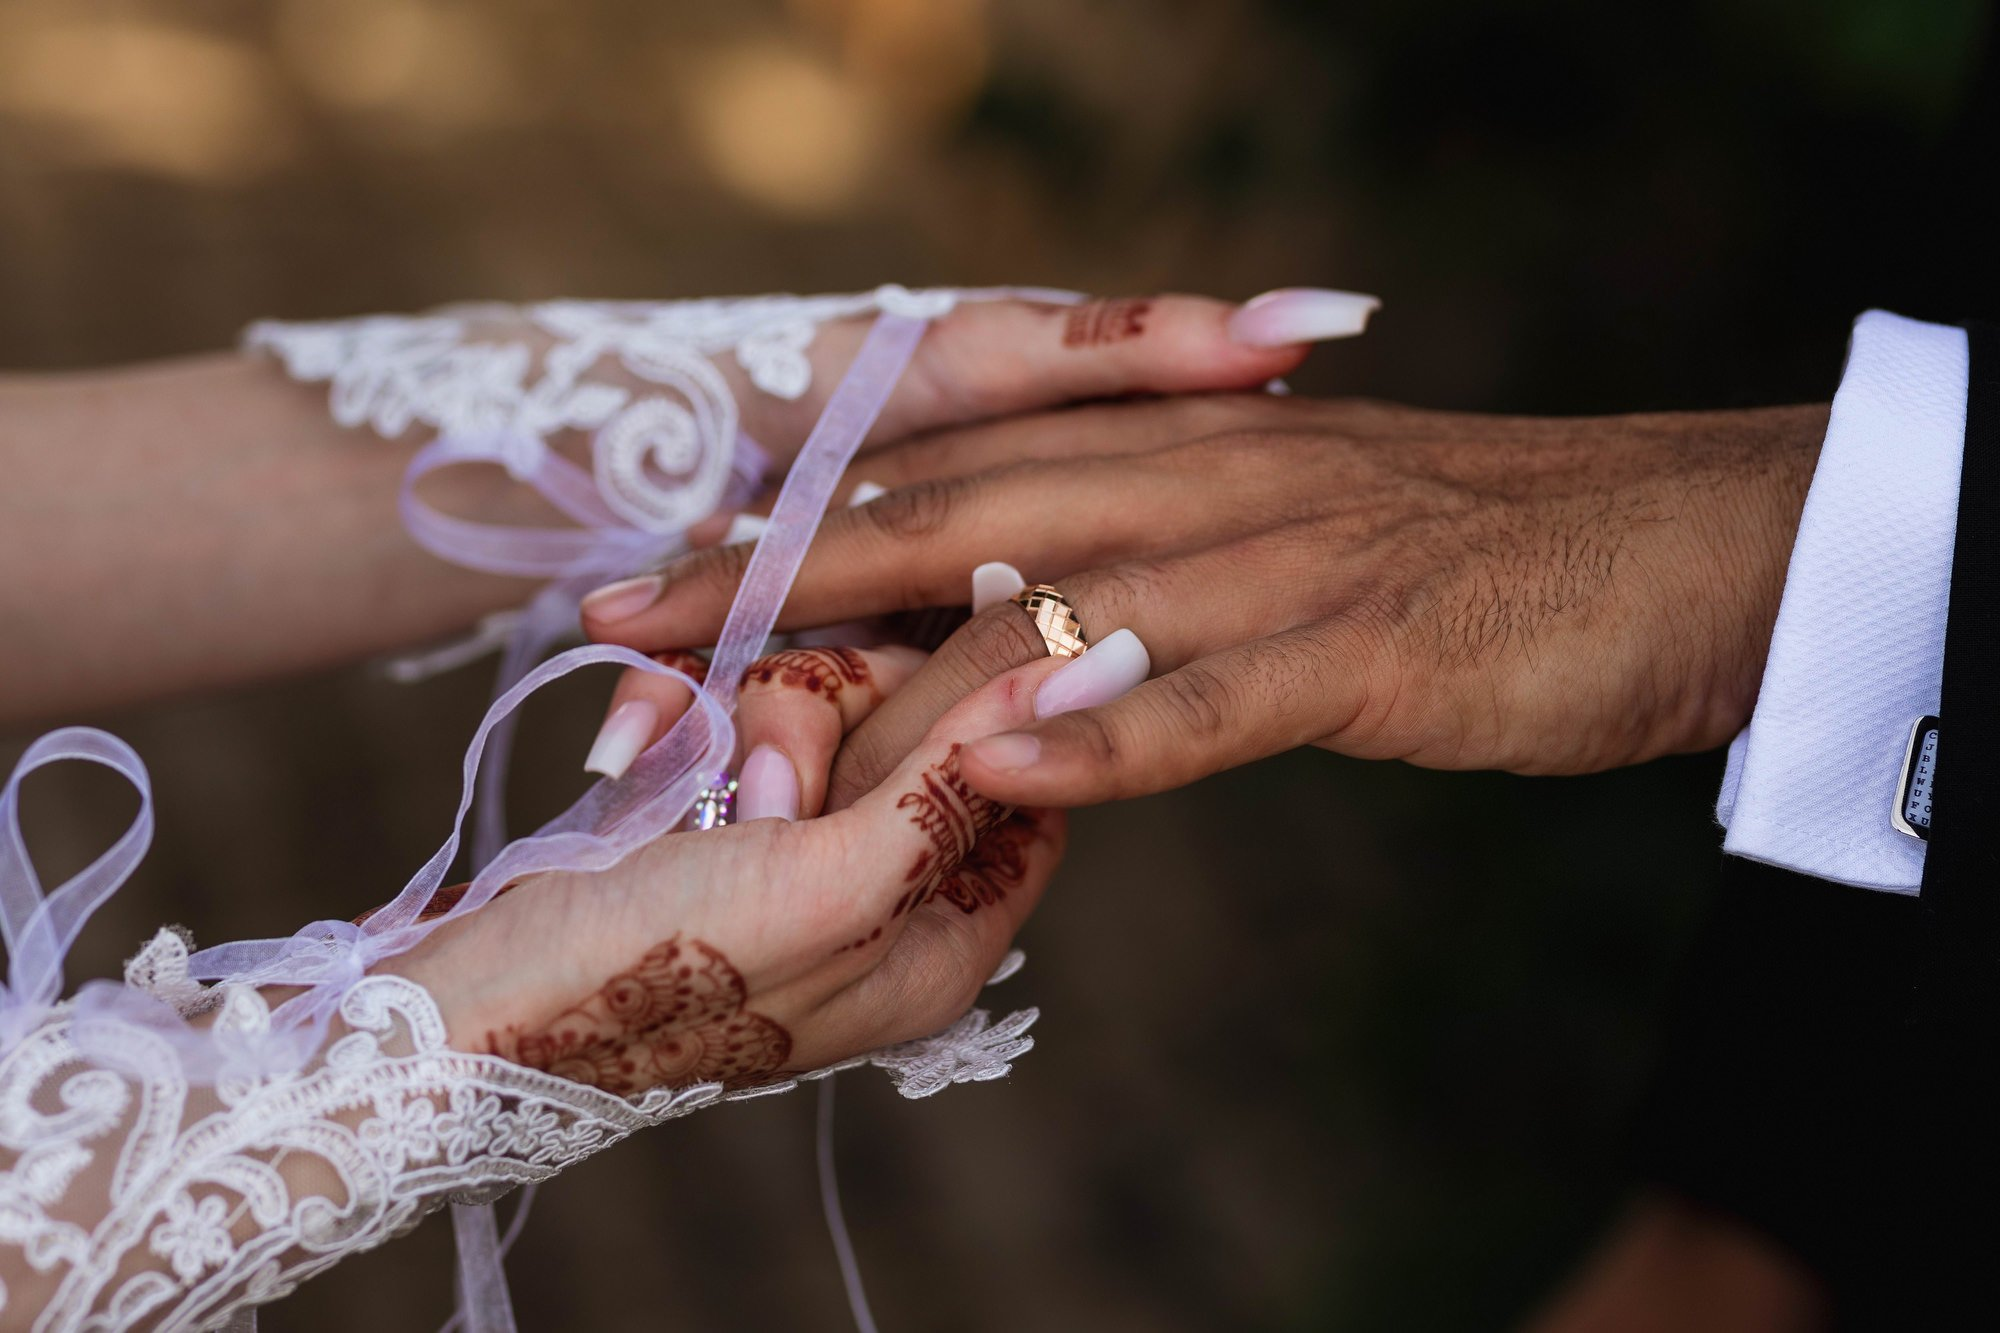 Euridge Manor, Cotswolds, civil ceremony, bride and groom, Exchange of rings, Cotswolds wedding photographer